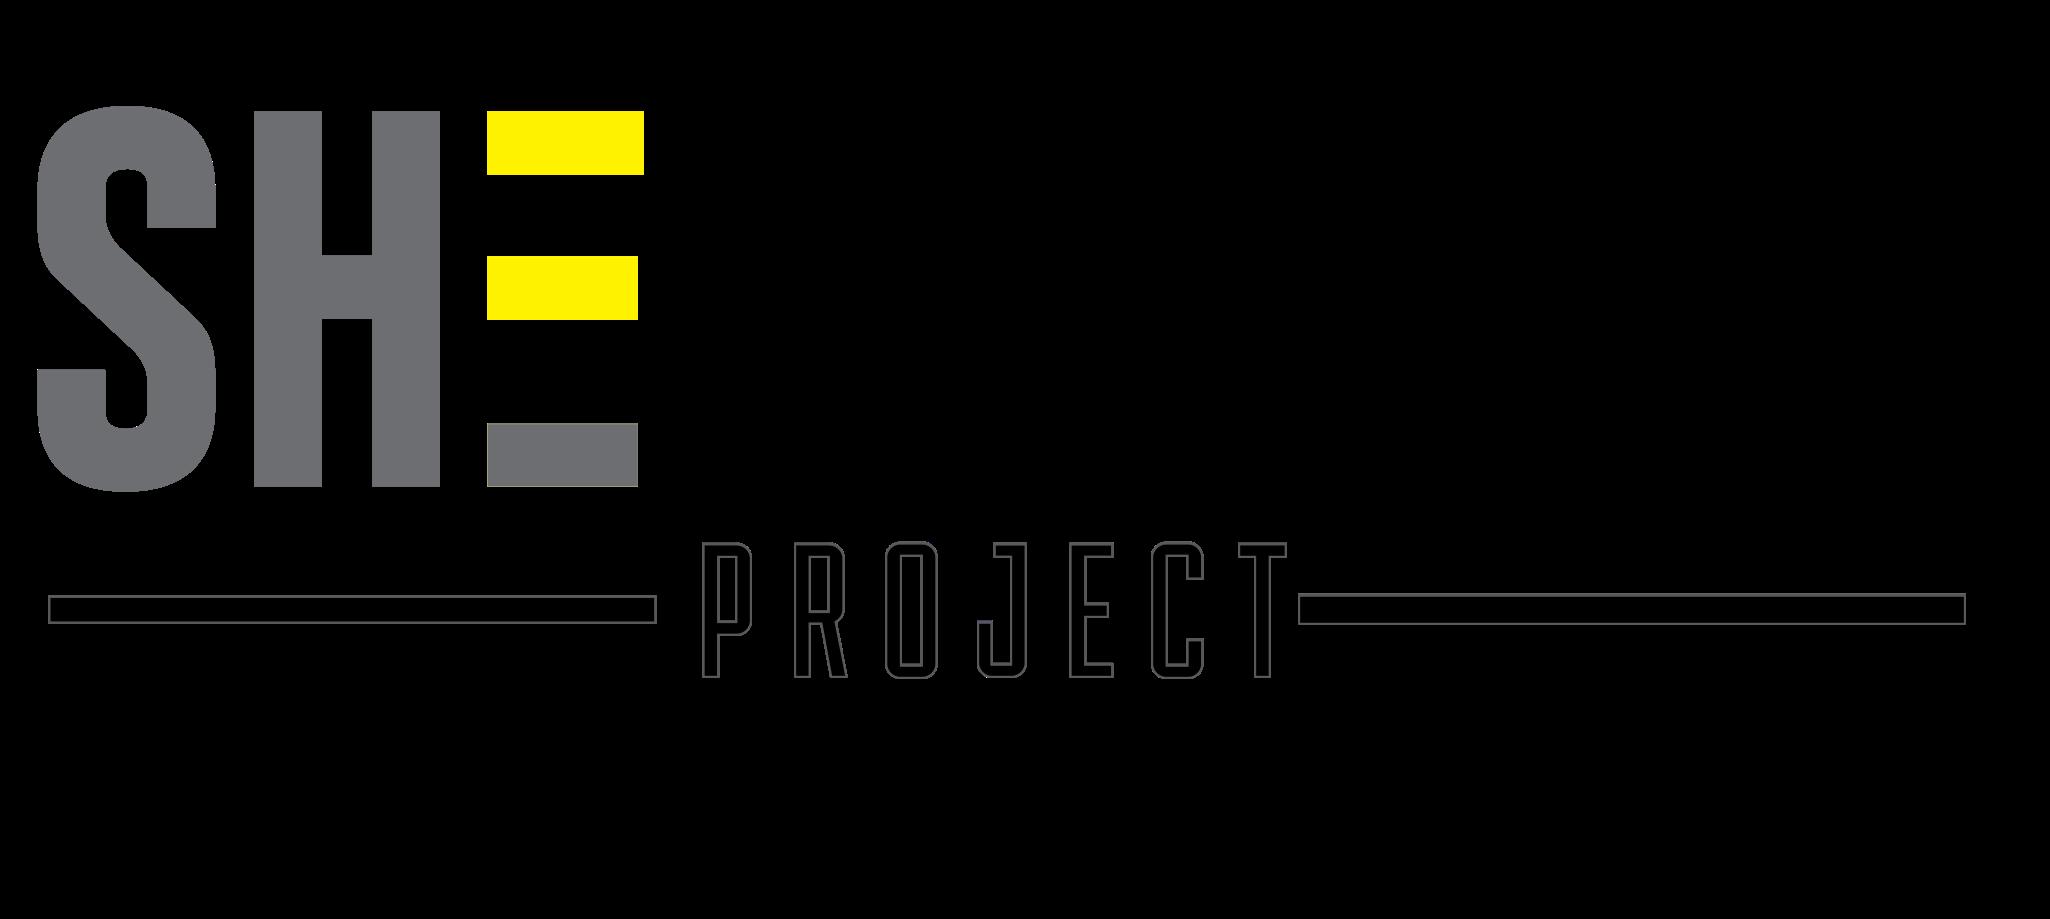 shequality-logo